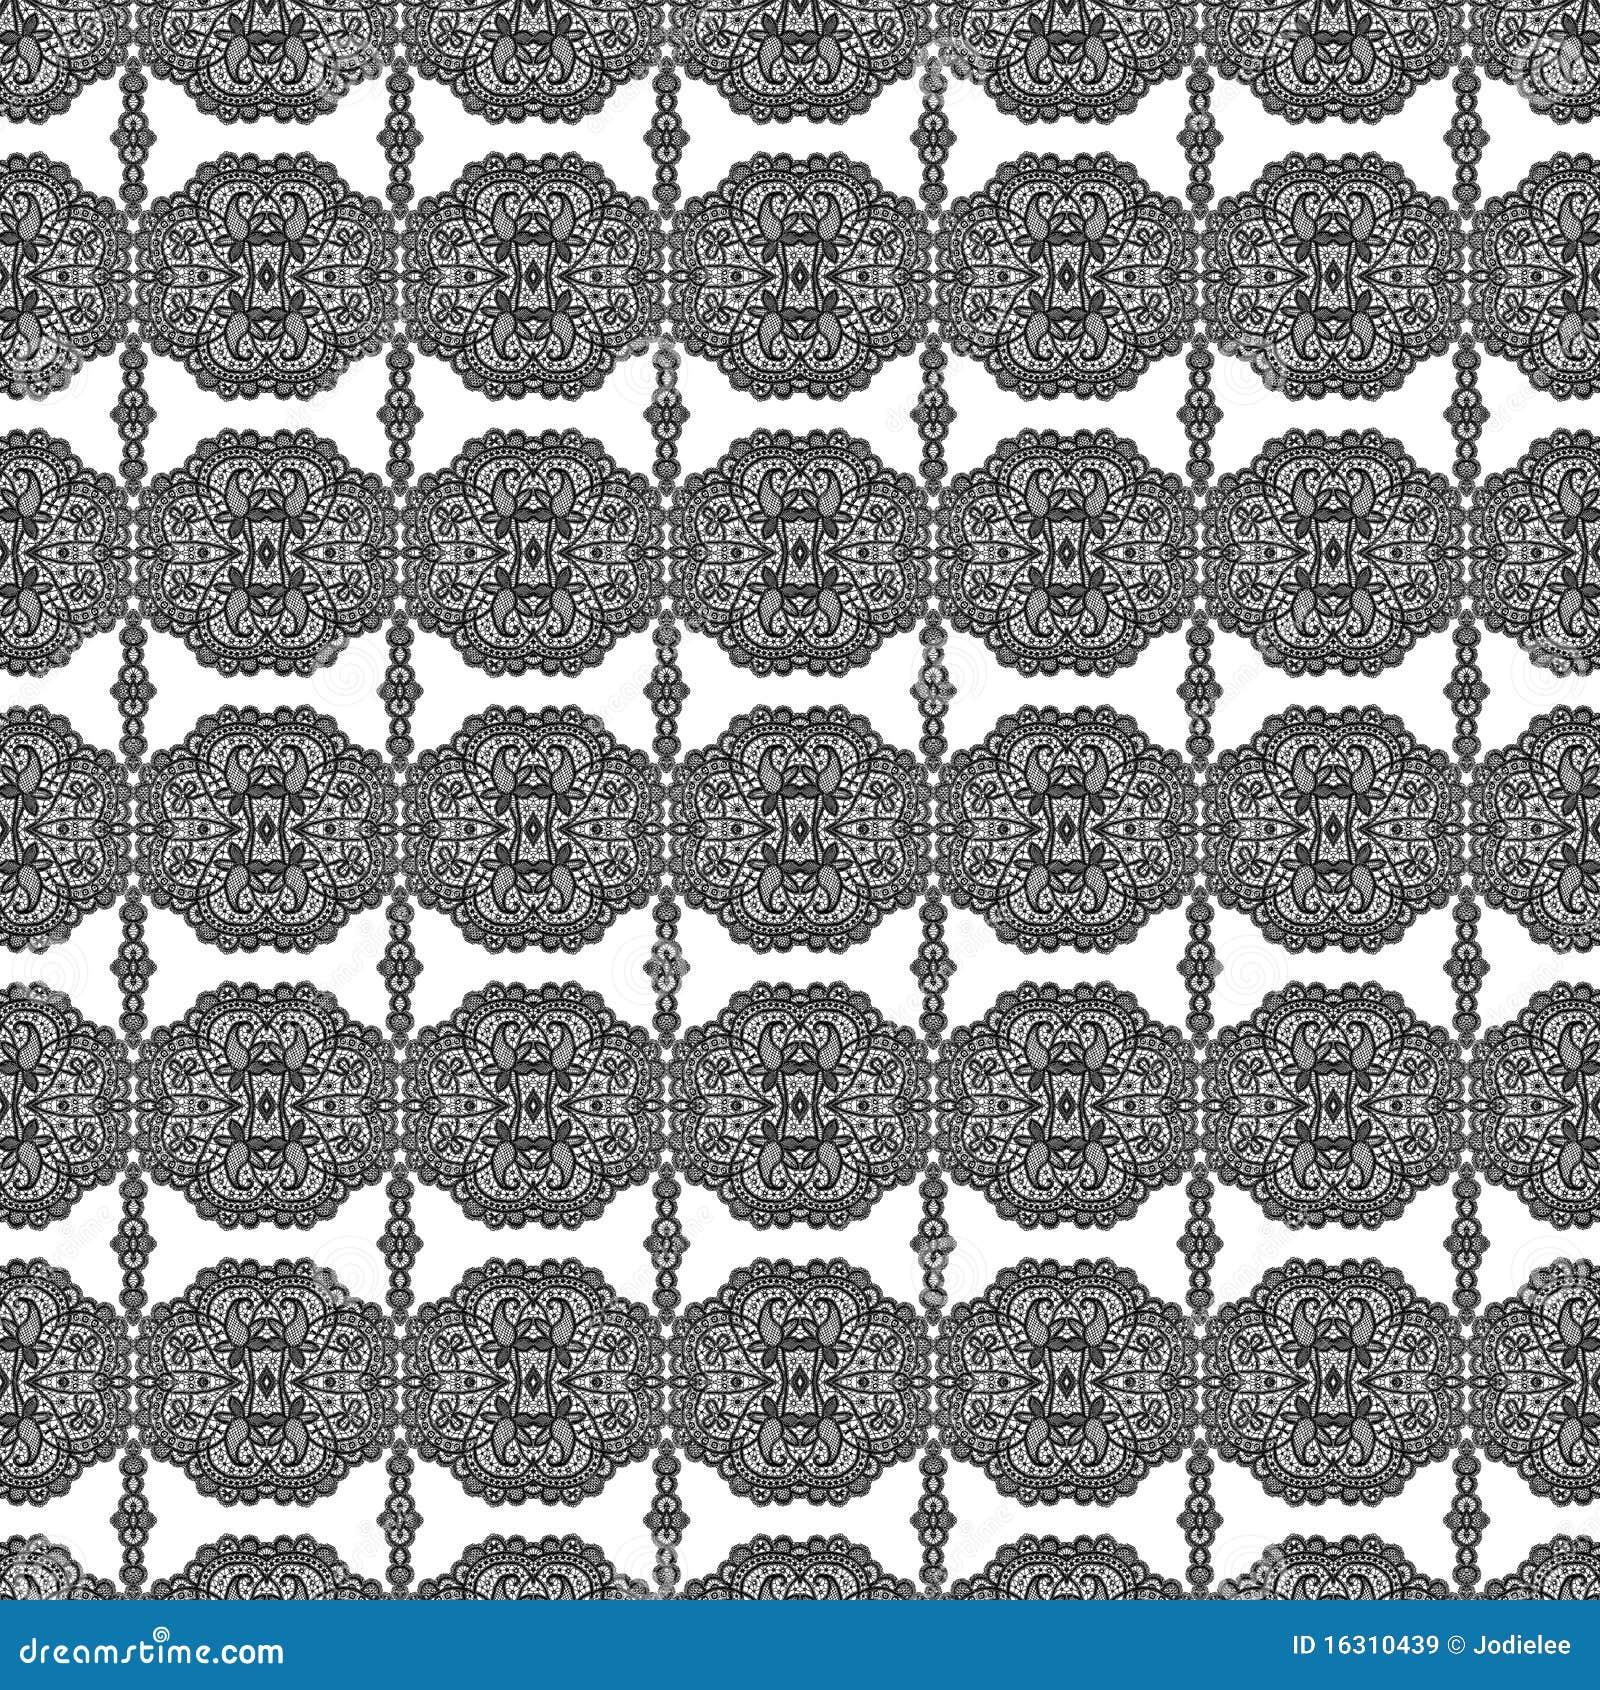 lace background tile - photo #12